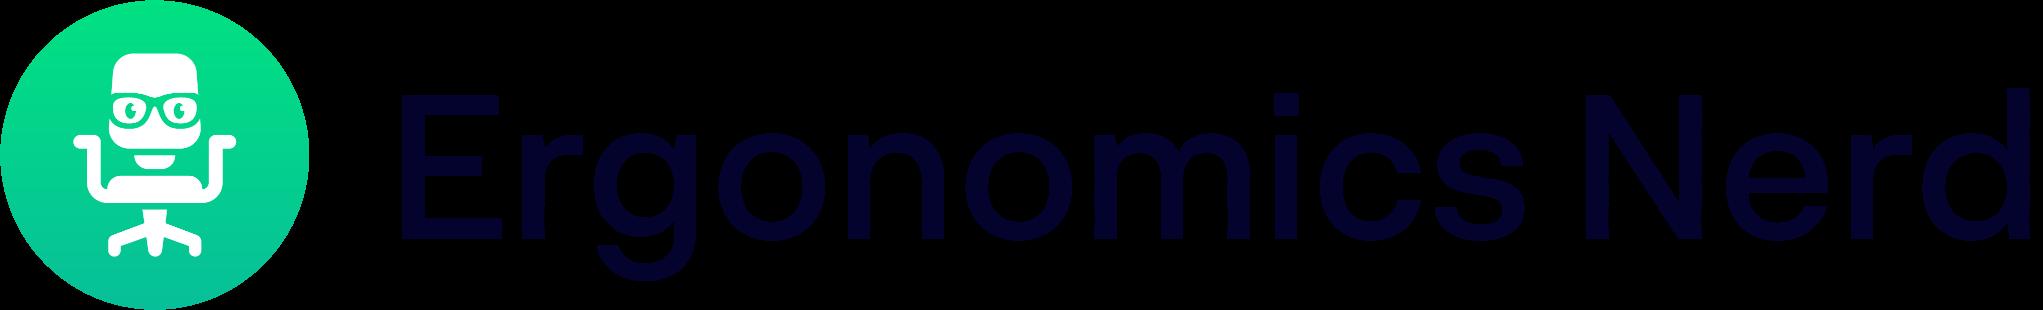 Ergonomics Nerd Logo